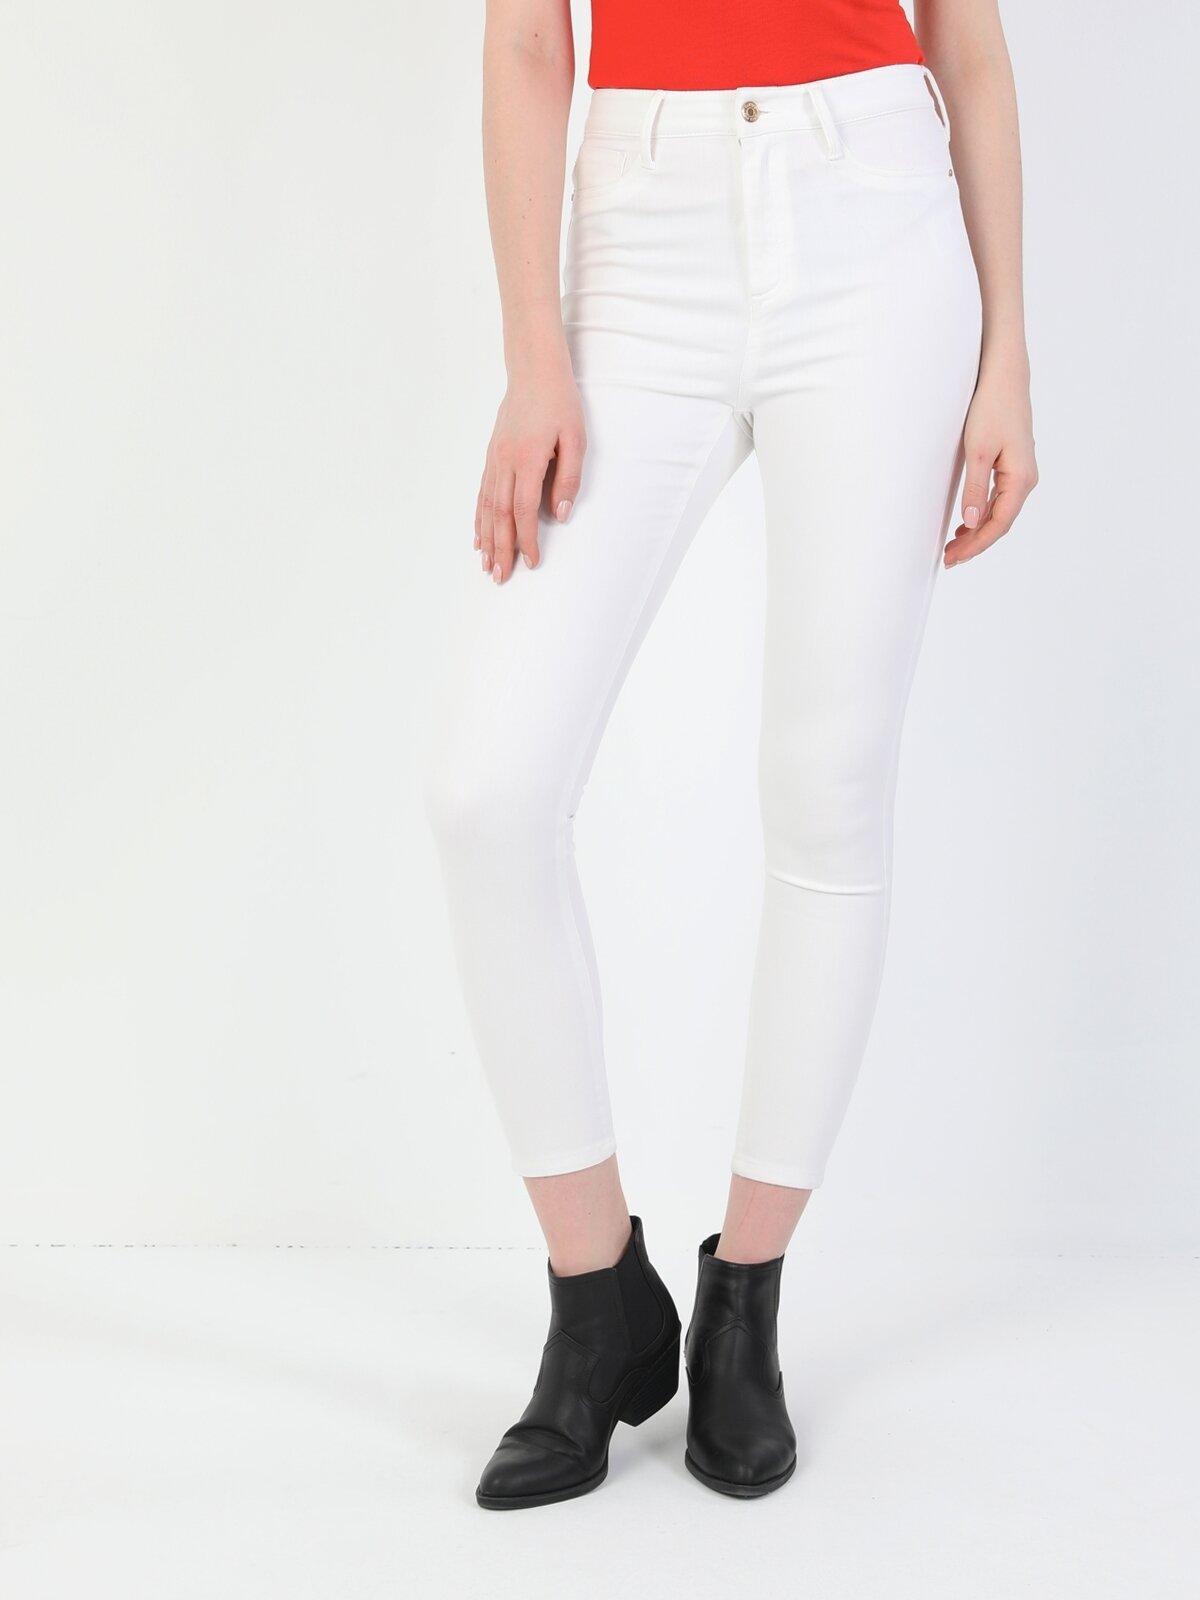 Super Slim Fit Yüksek Bel Skinny Leg Kadın Beyaz Pantolon